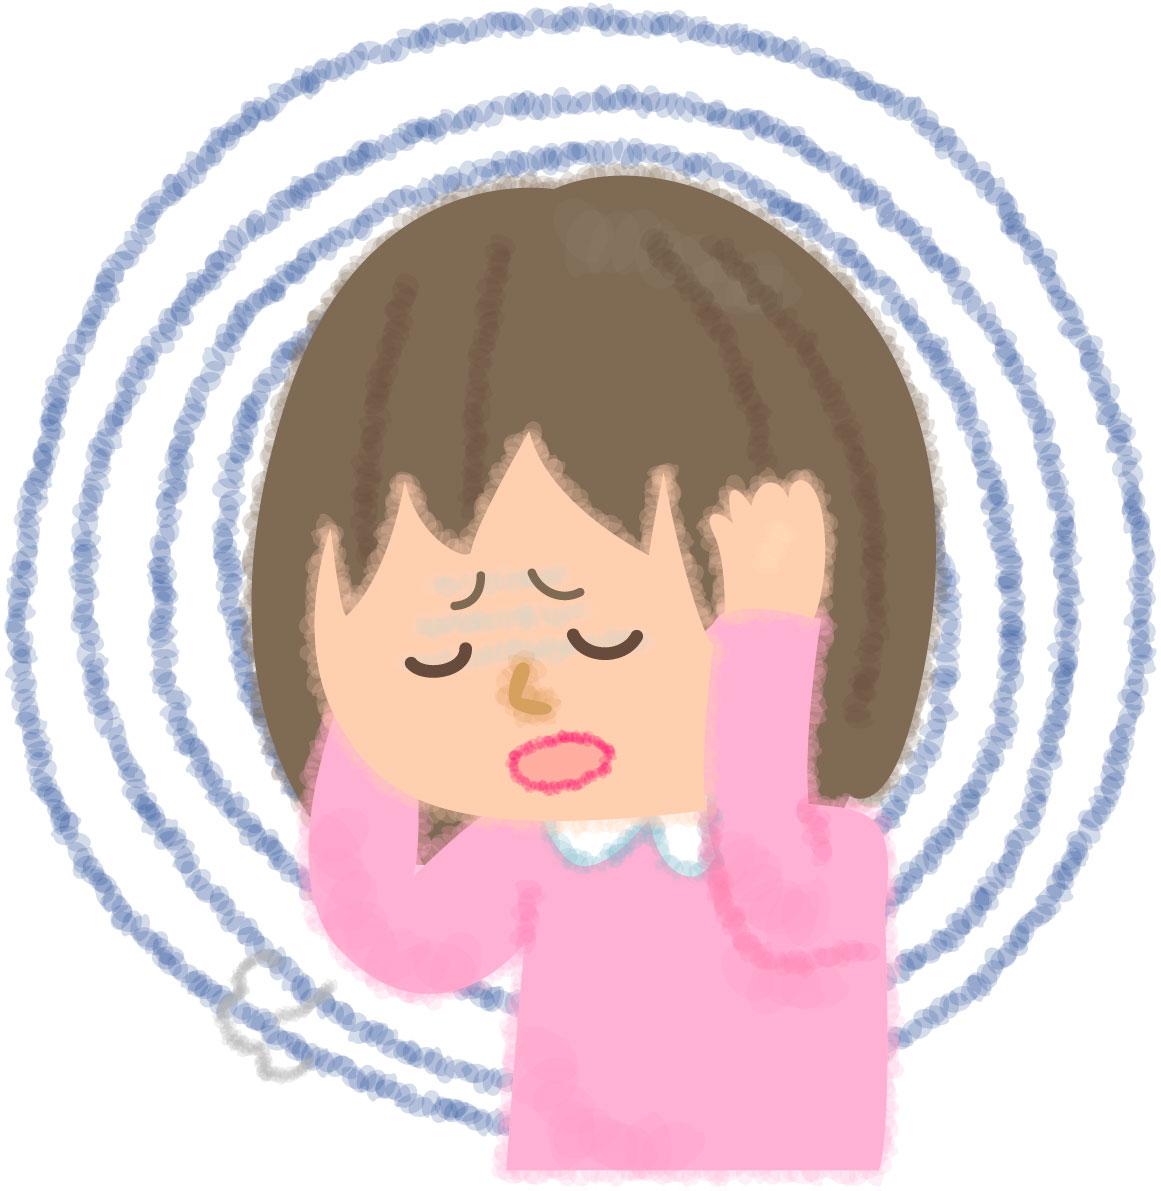 f:id:oyaku-dachi:20200810234410j:plain